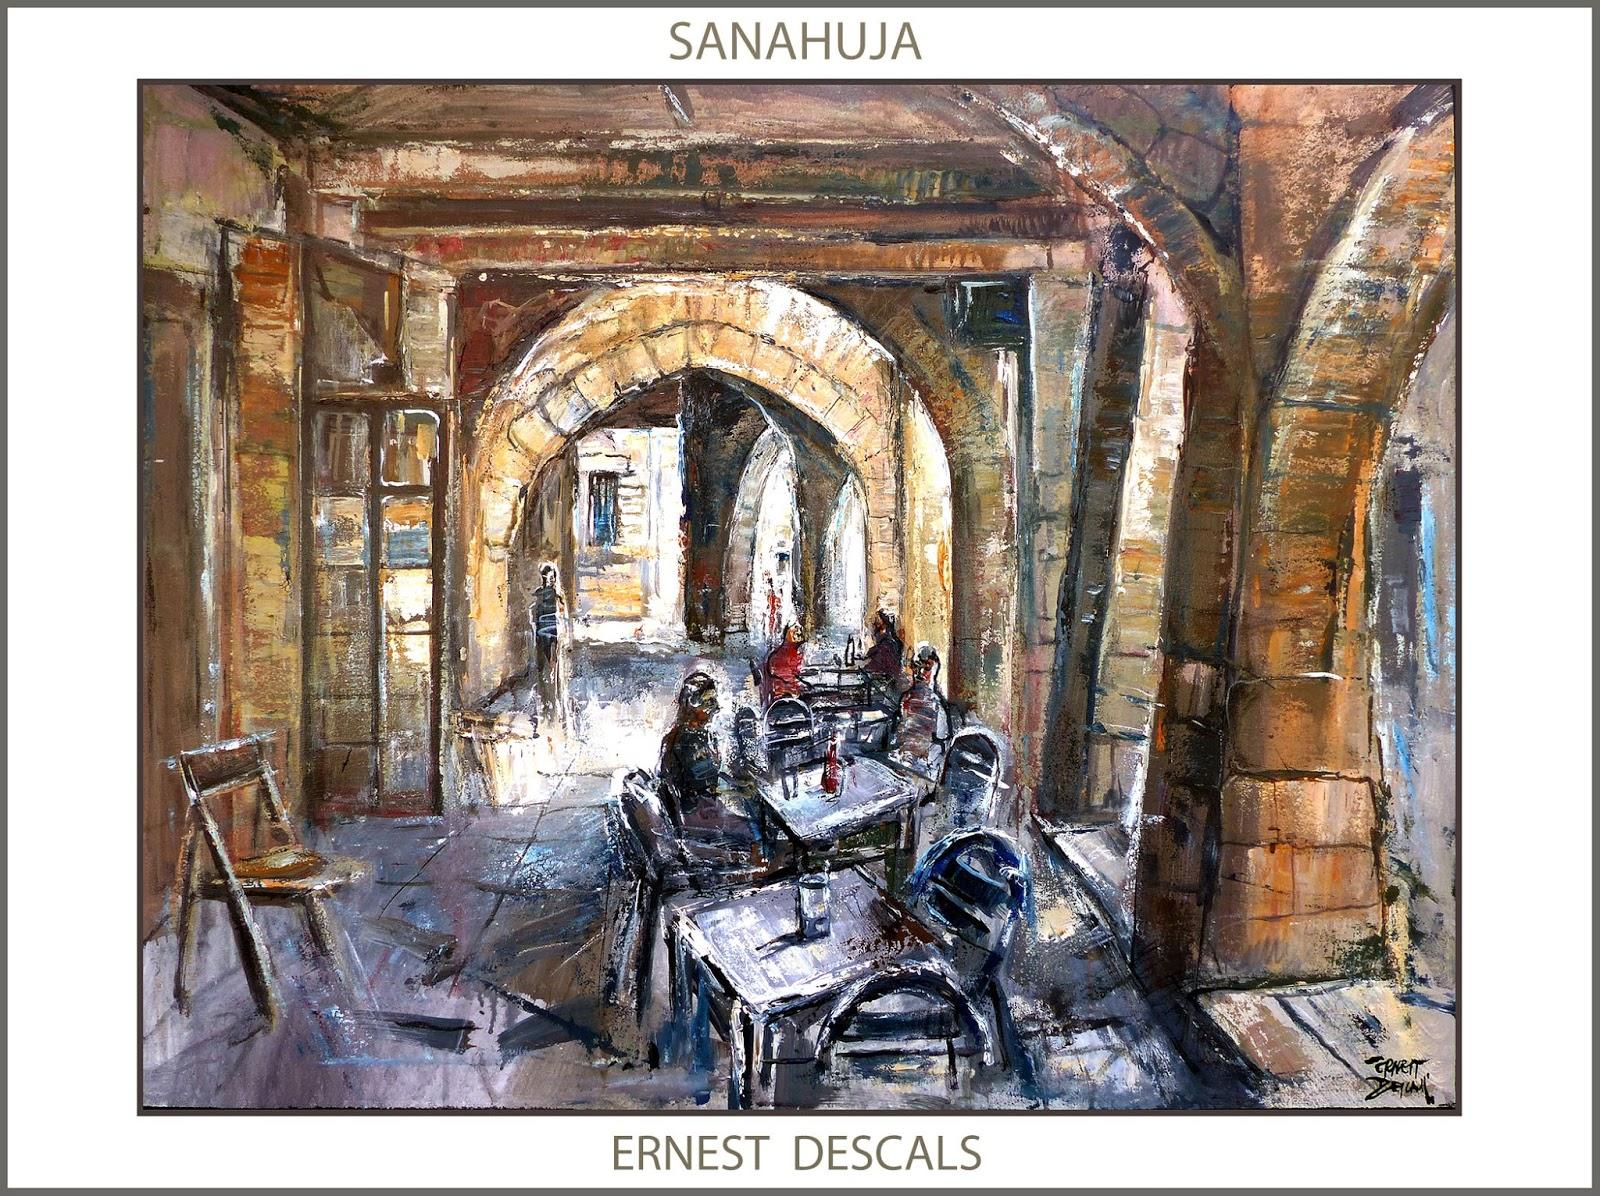 Ernest descals artista pintor sanahuja pintura cafeteria lleida paisatges paisajes la segarra - Pintores en lleida ...